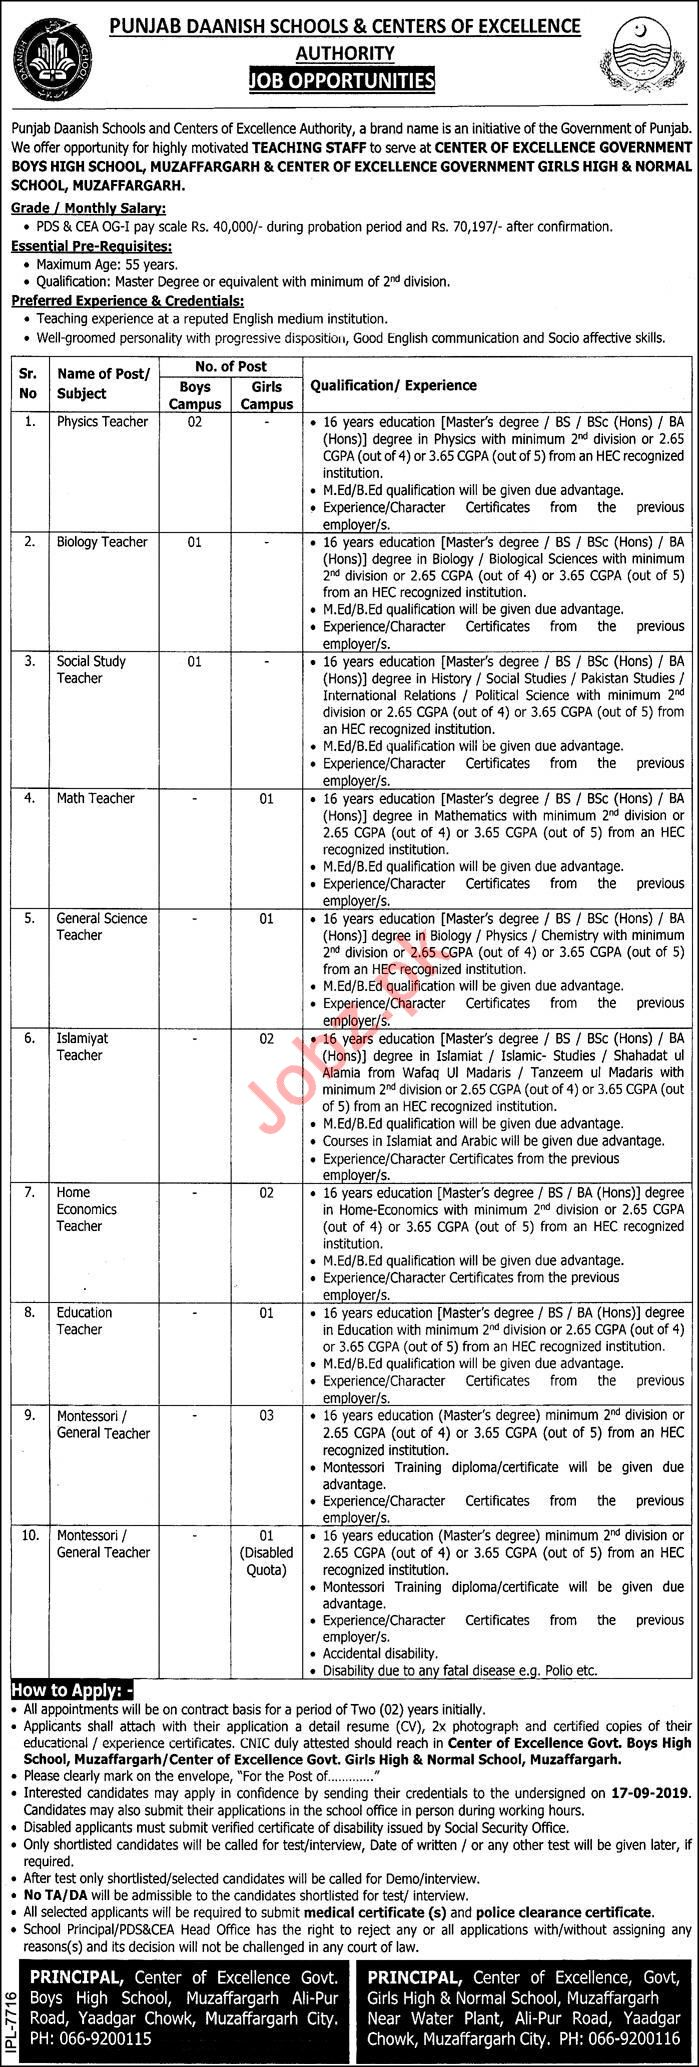 Punjab Daanish Schools Faculty Jobs in Muzaffargarh